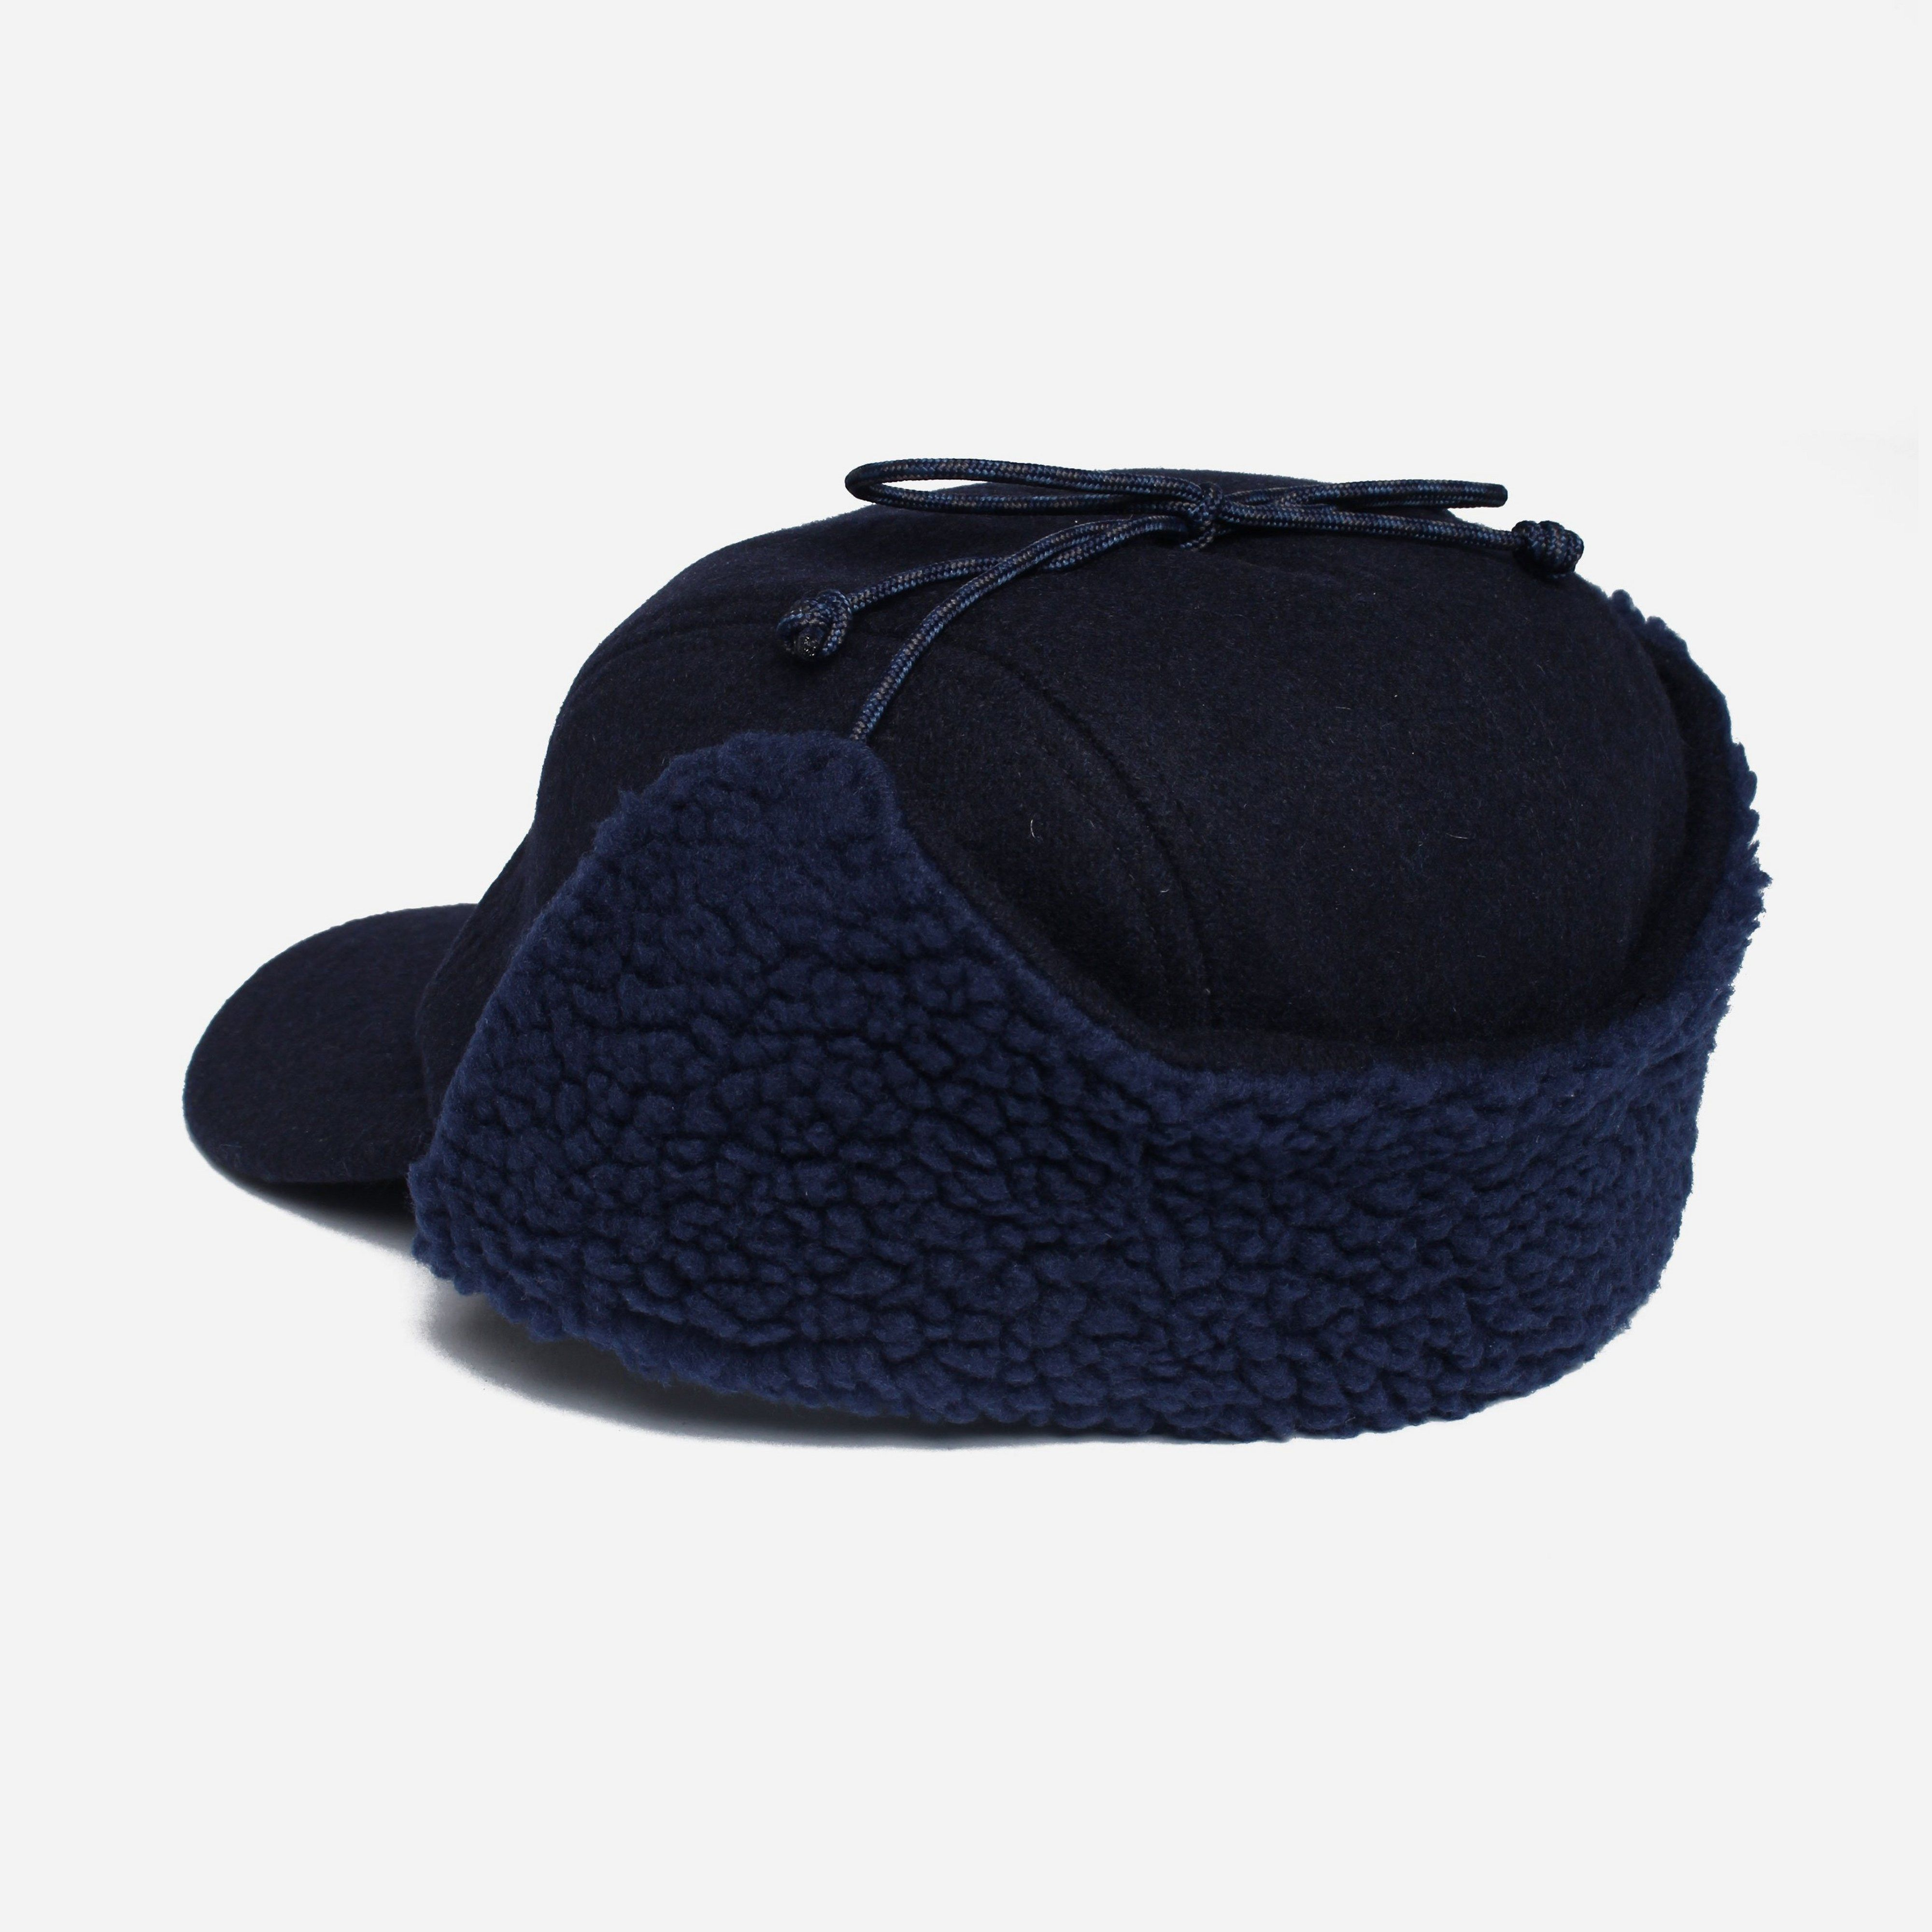 Patagonia Recycled Wool Ear Flat Cap